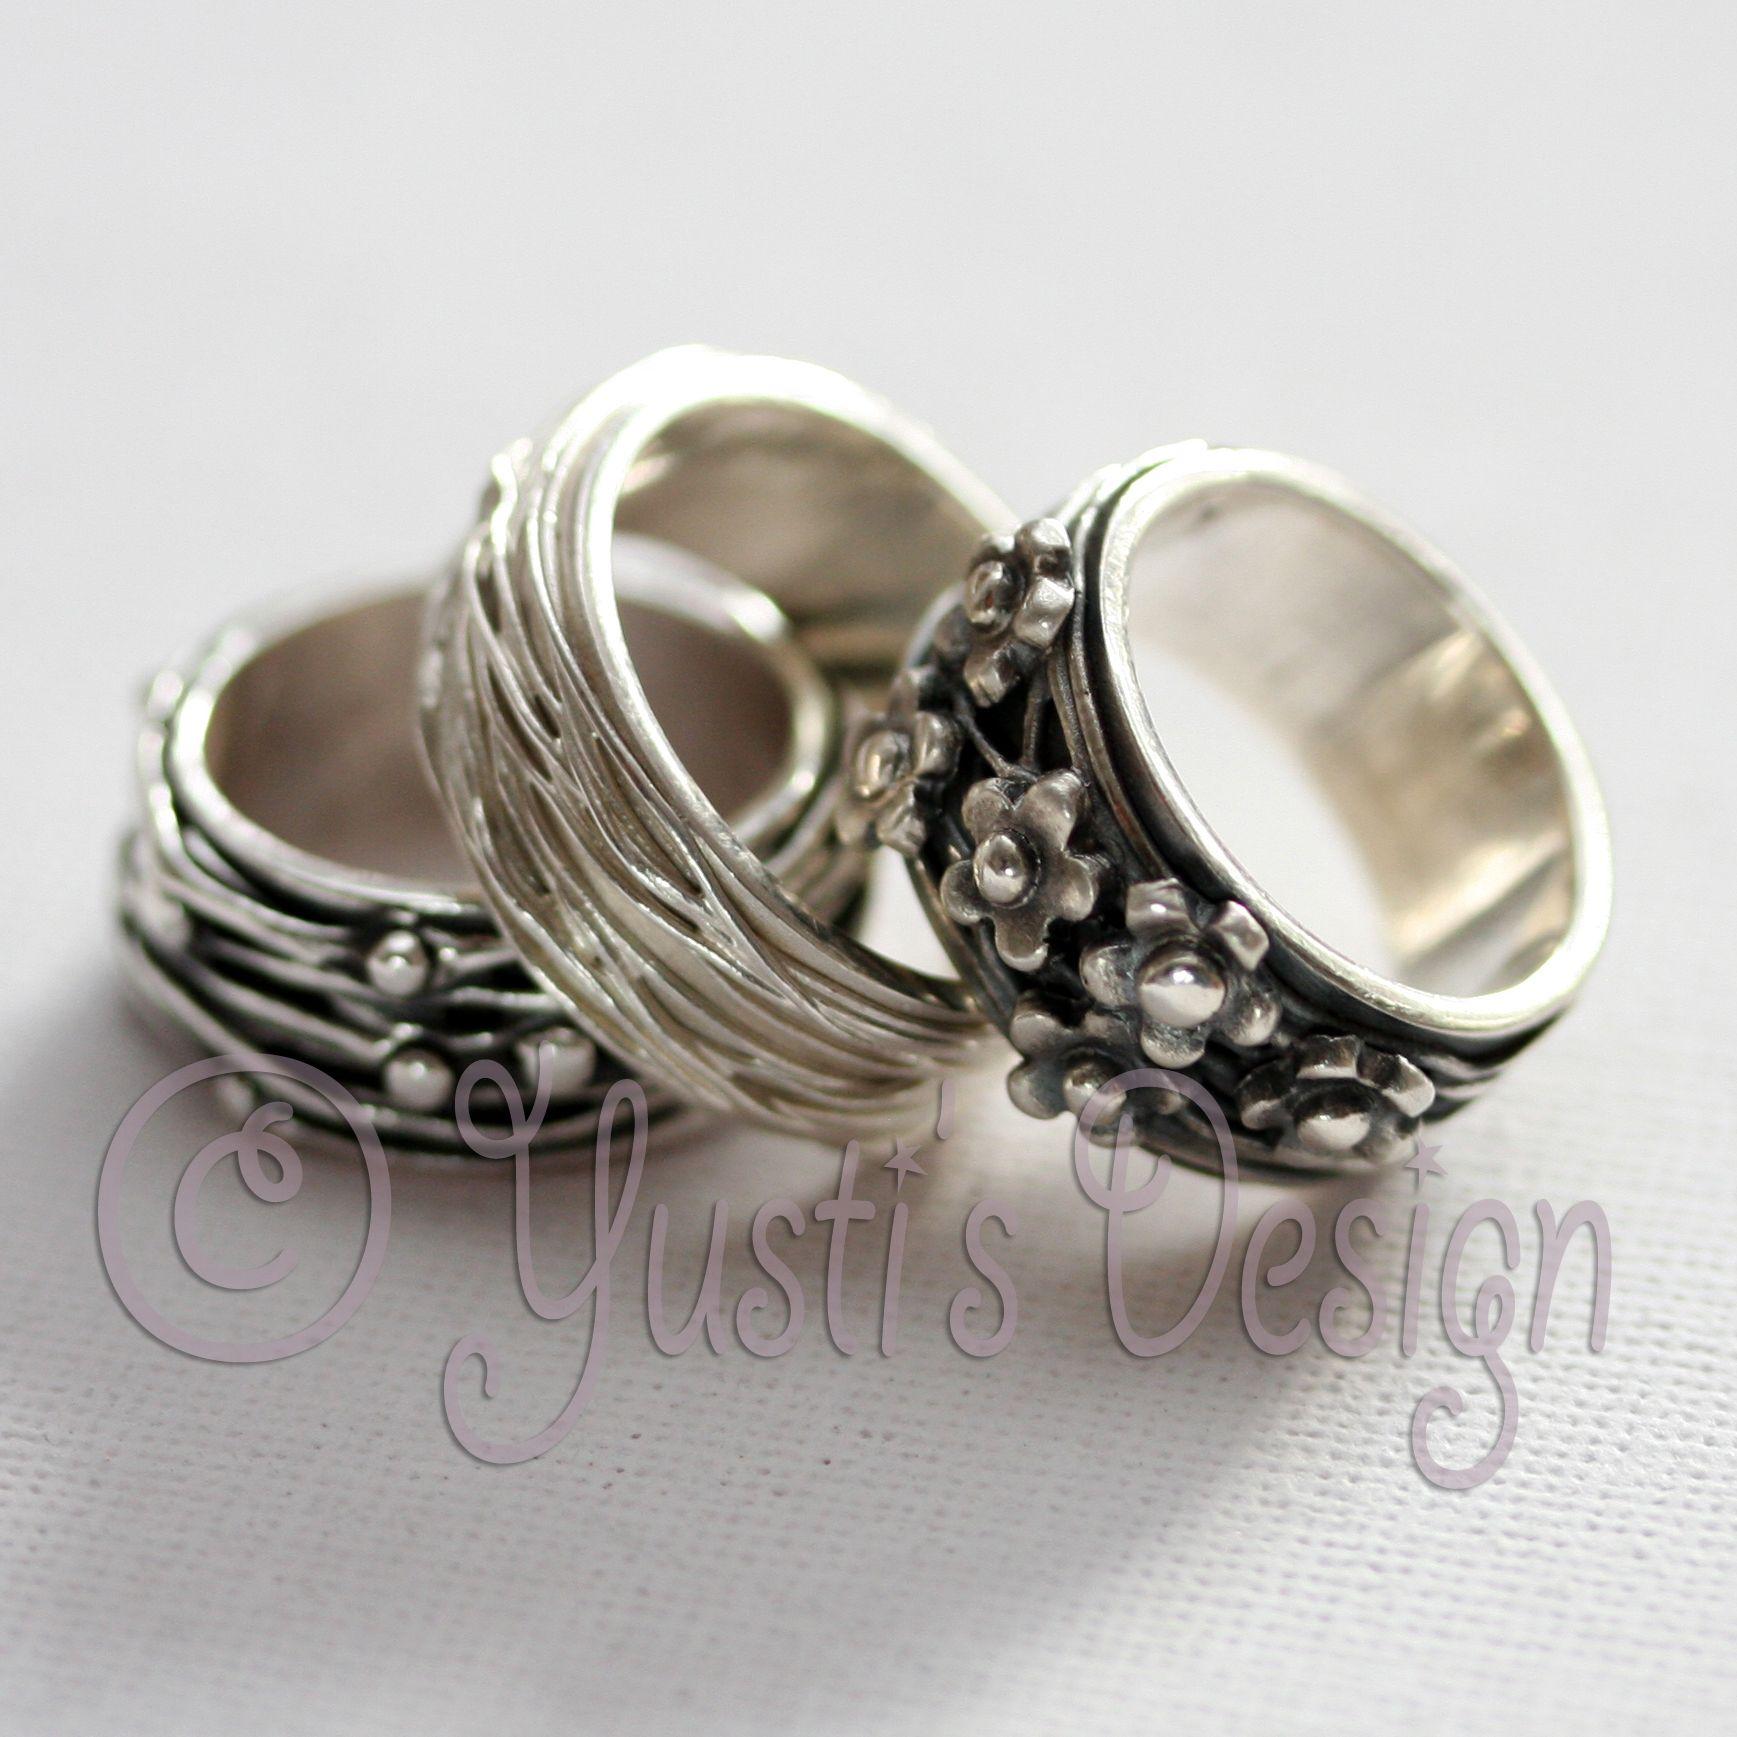 Zilverklei Ringen Silver Clay Rings Made by me